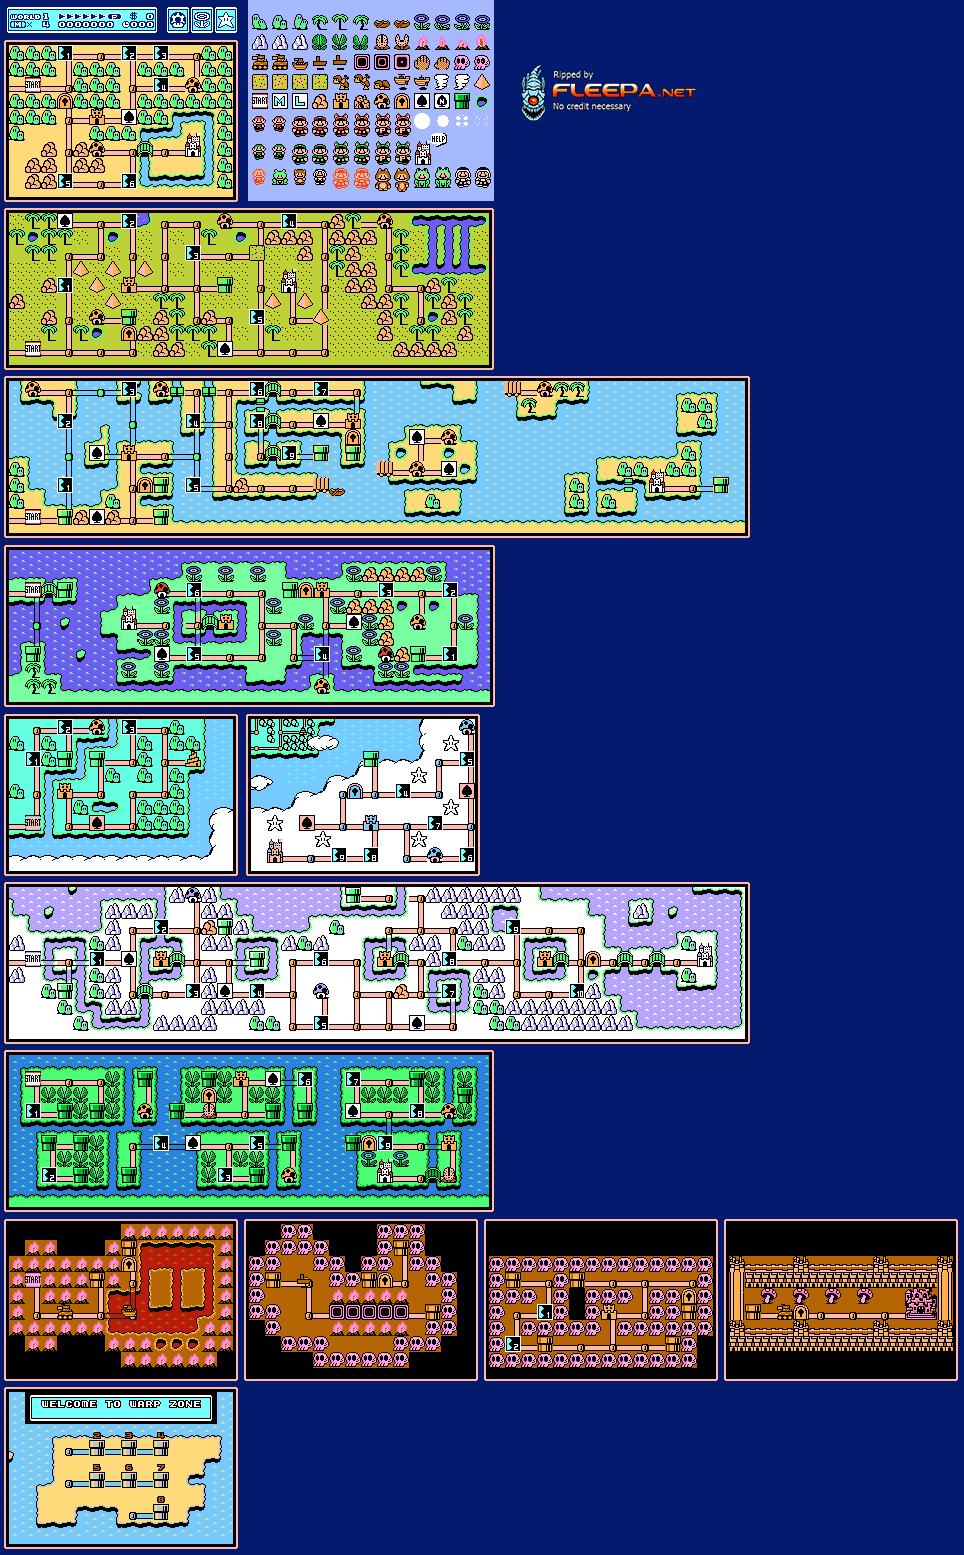 Nes Super Mario Bros 3 Maps The Spriters Resource